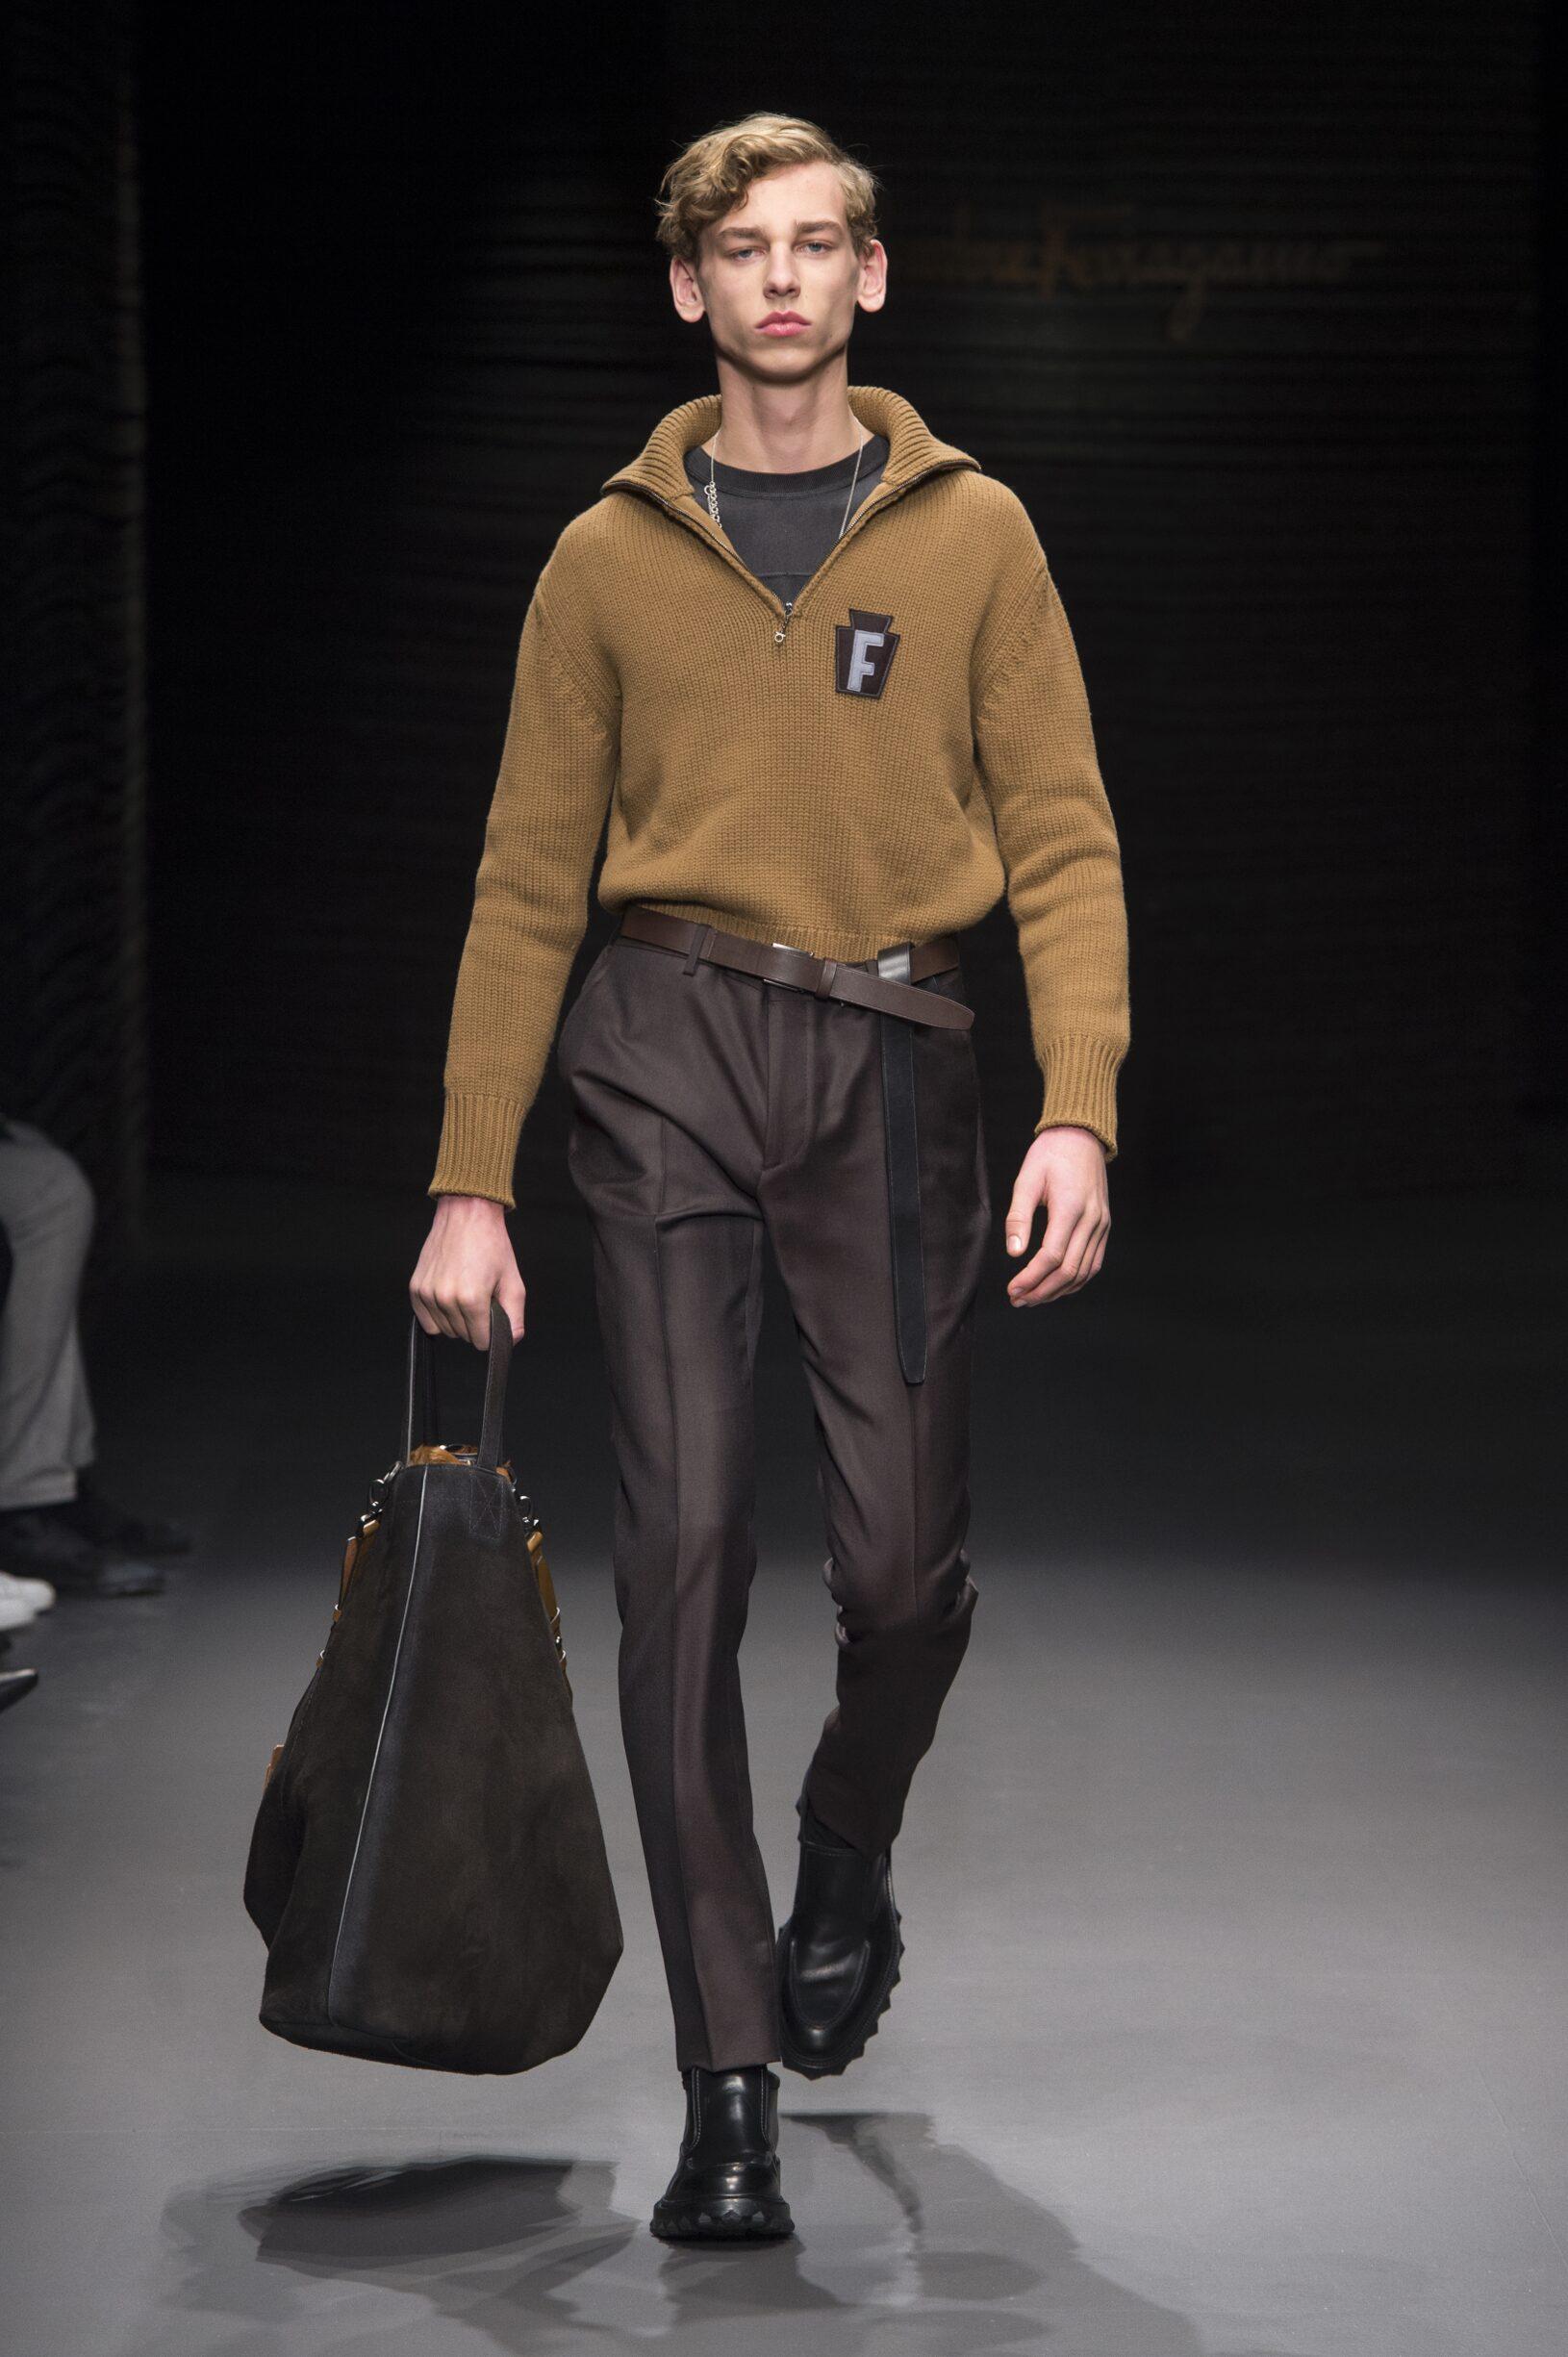 Winter 2017 Man Trends Salvatore Ferragamo